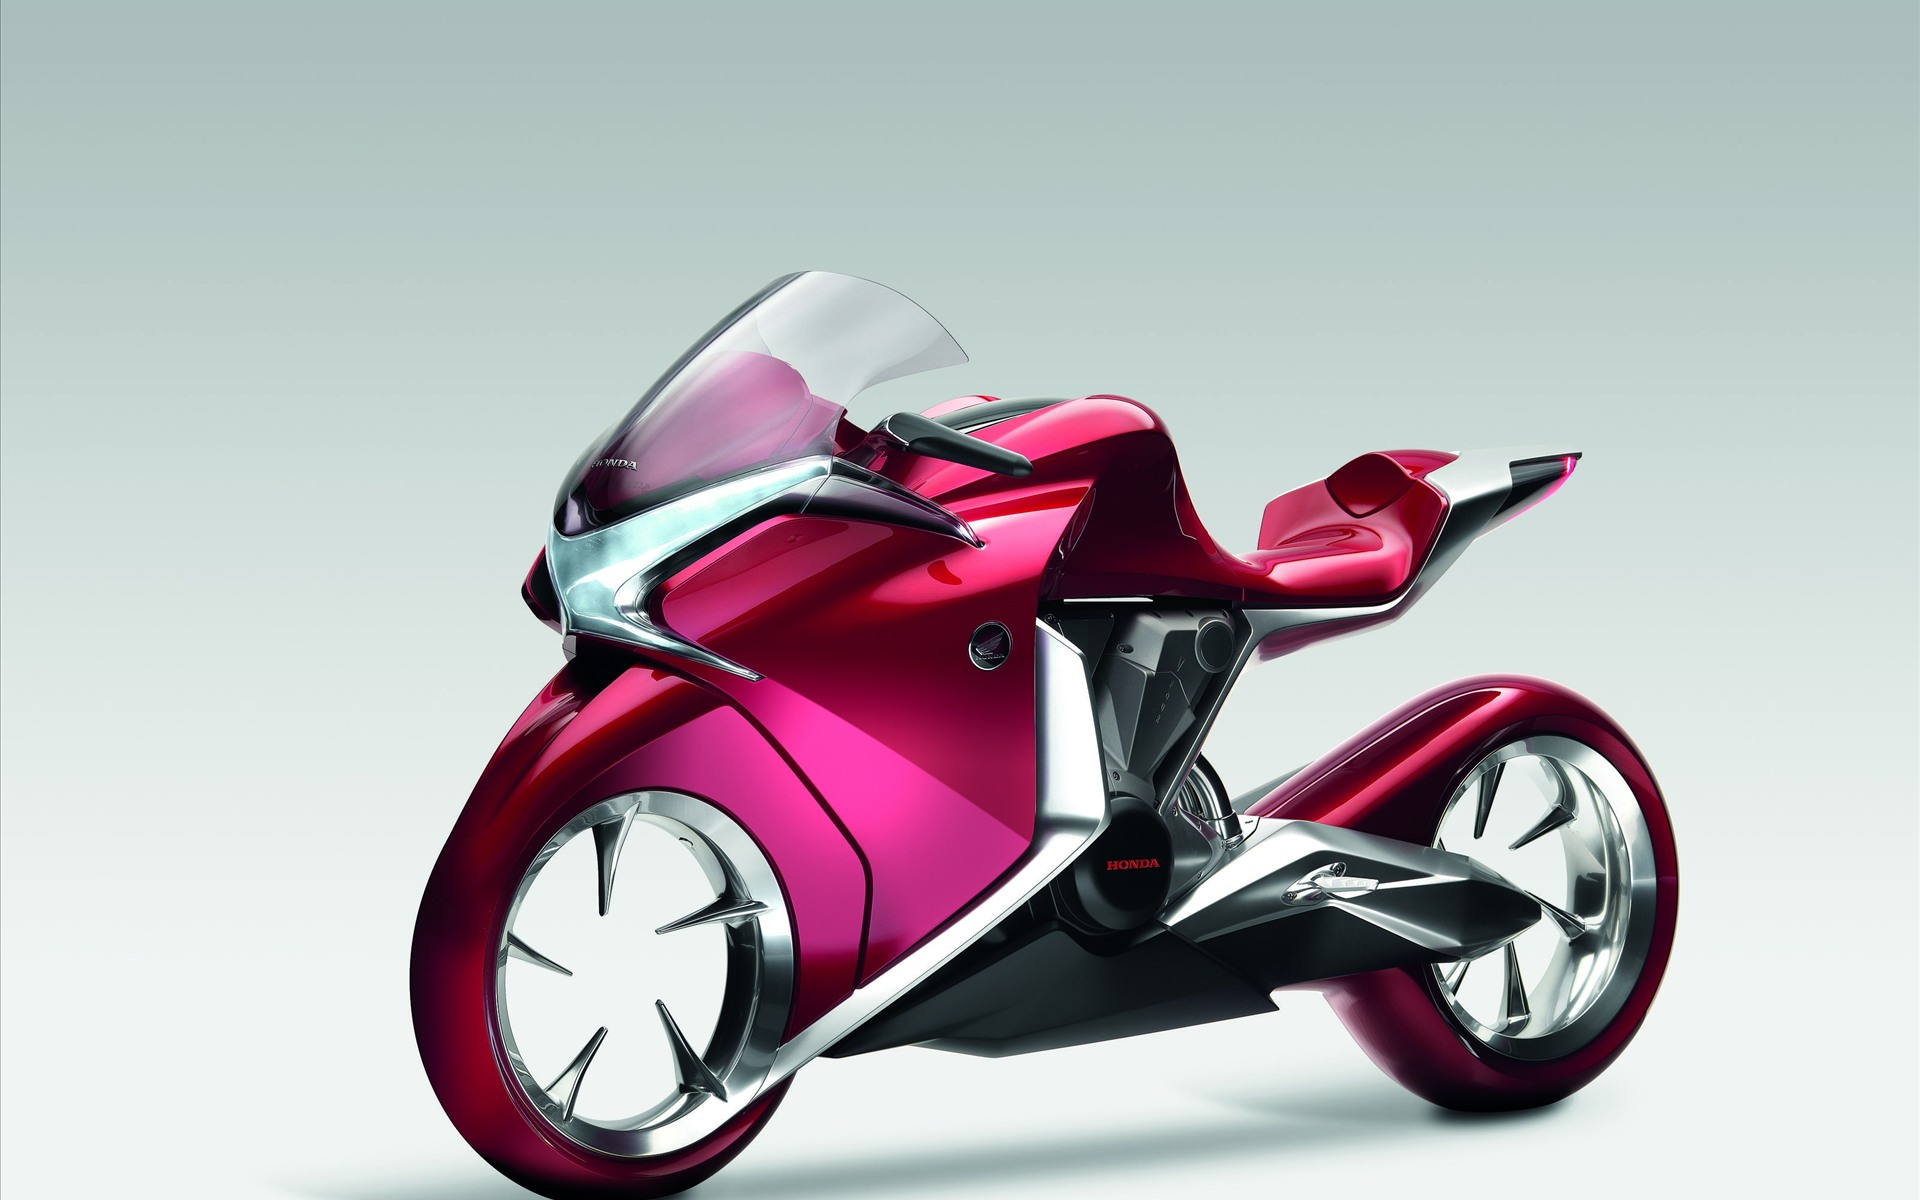 Honda V4 Concept Widescreen Bike Wallpapers HD Wallpapers 1920x1200